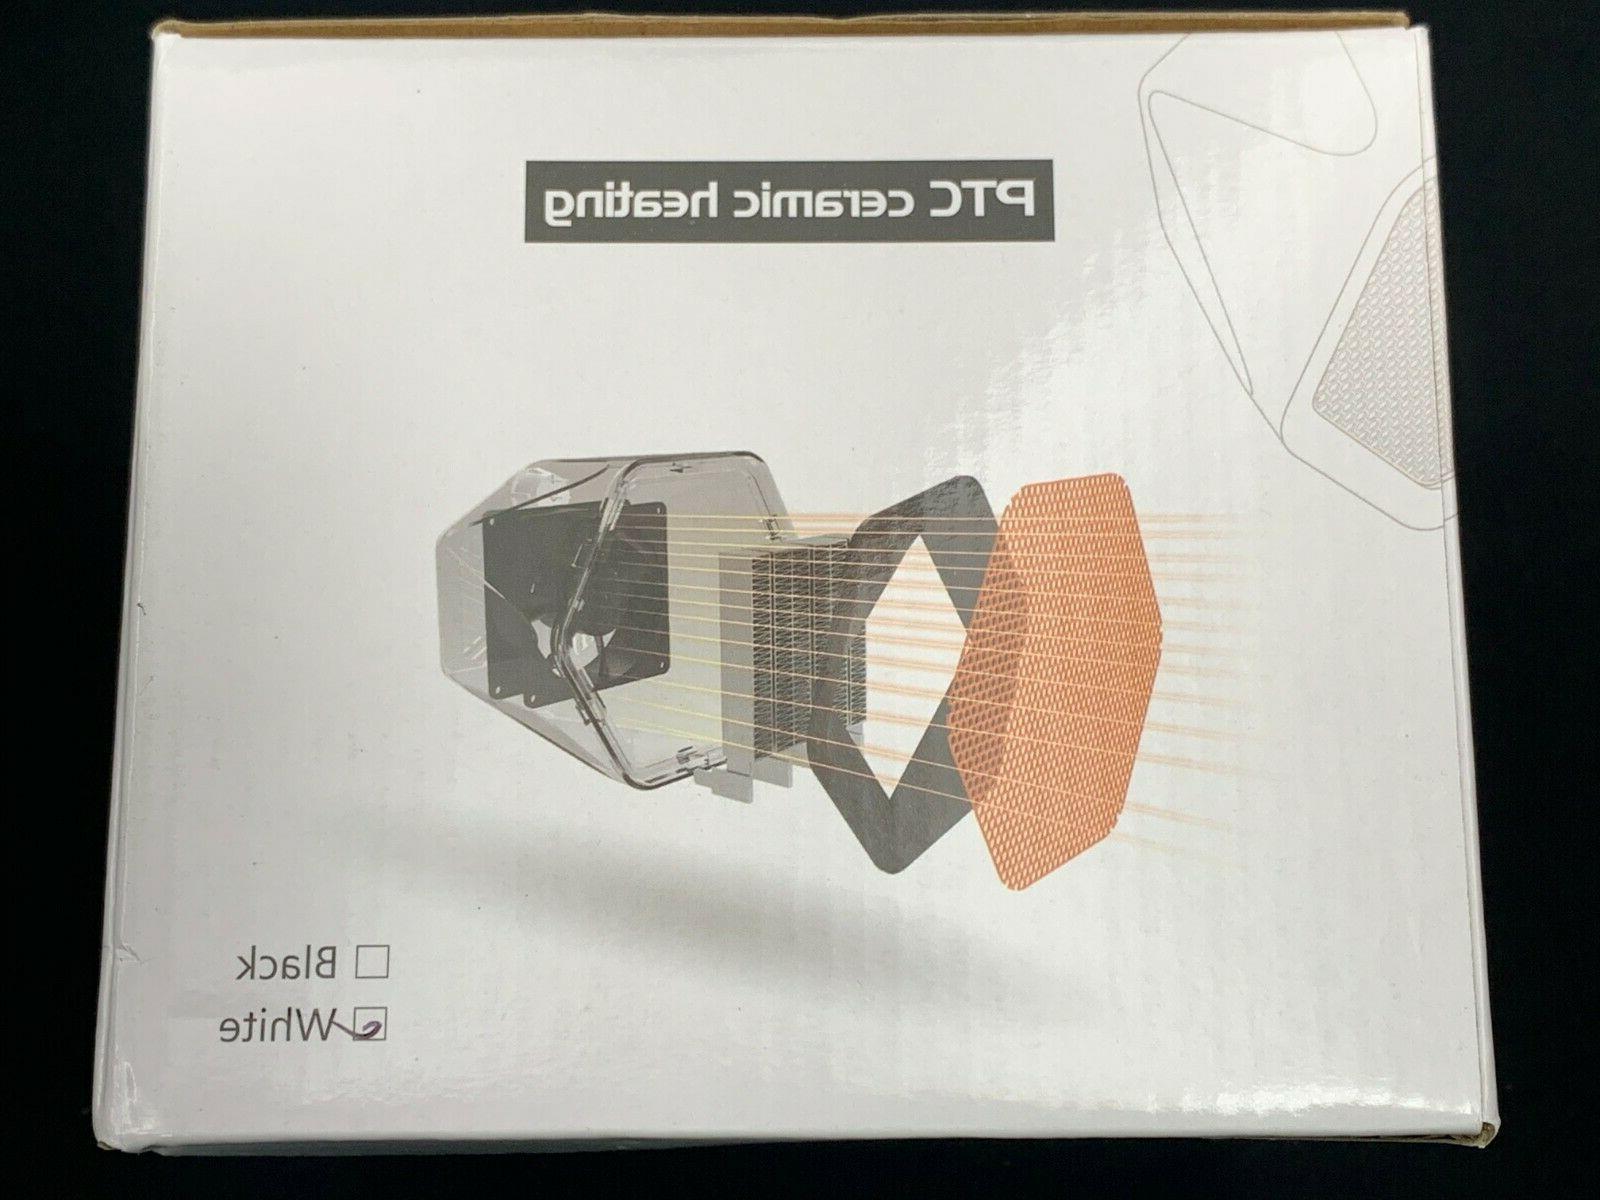 Gocheer 2-1 Portable Thermostat